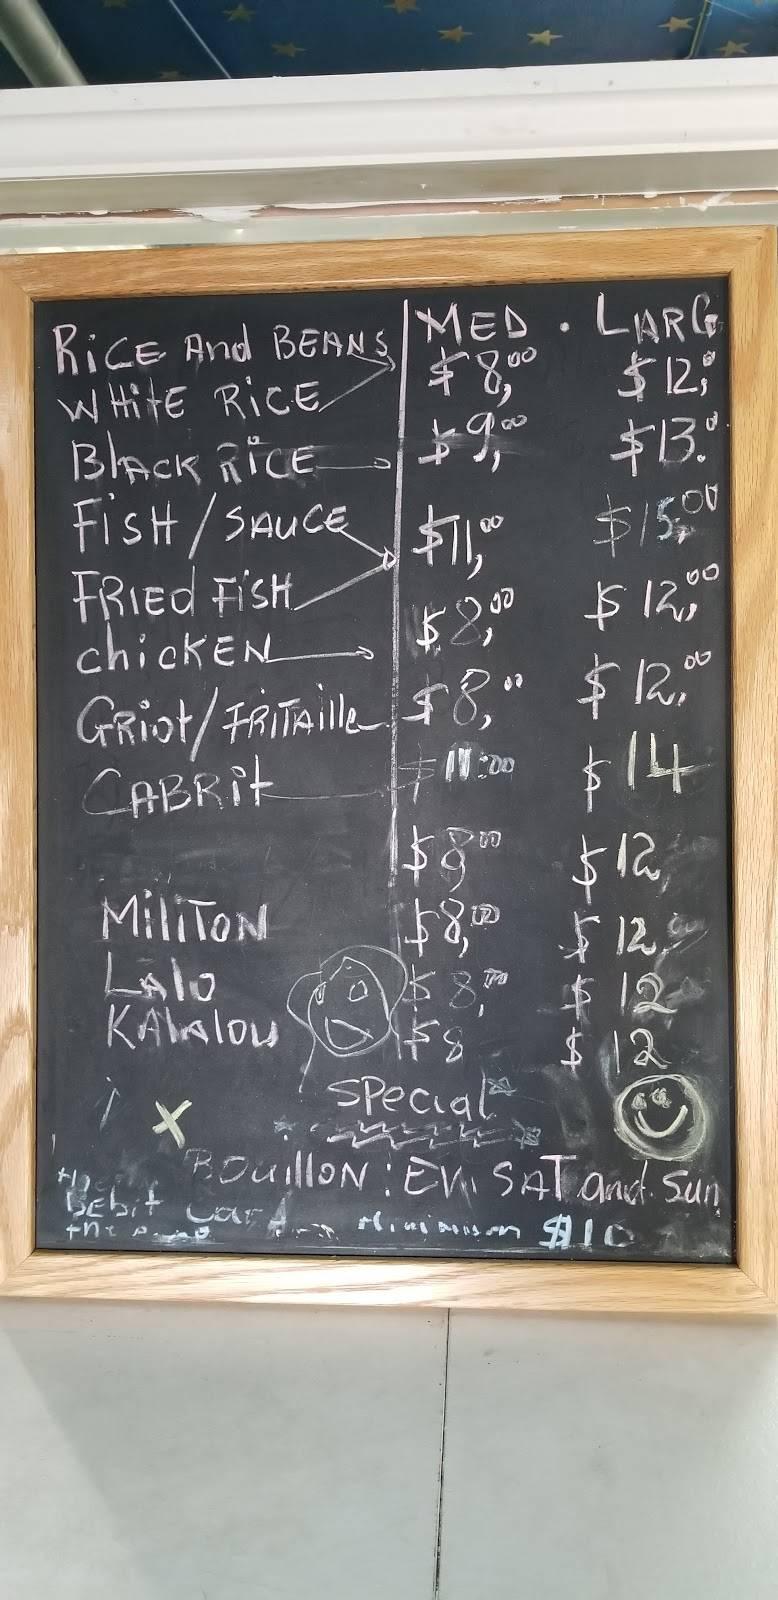 Haitian Caribbean Cuisine | restaurant | 167 Dodd St, East Orange, NJ 07017, USA | 9736756555 OR +1 973-675-6555